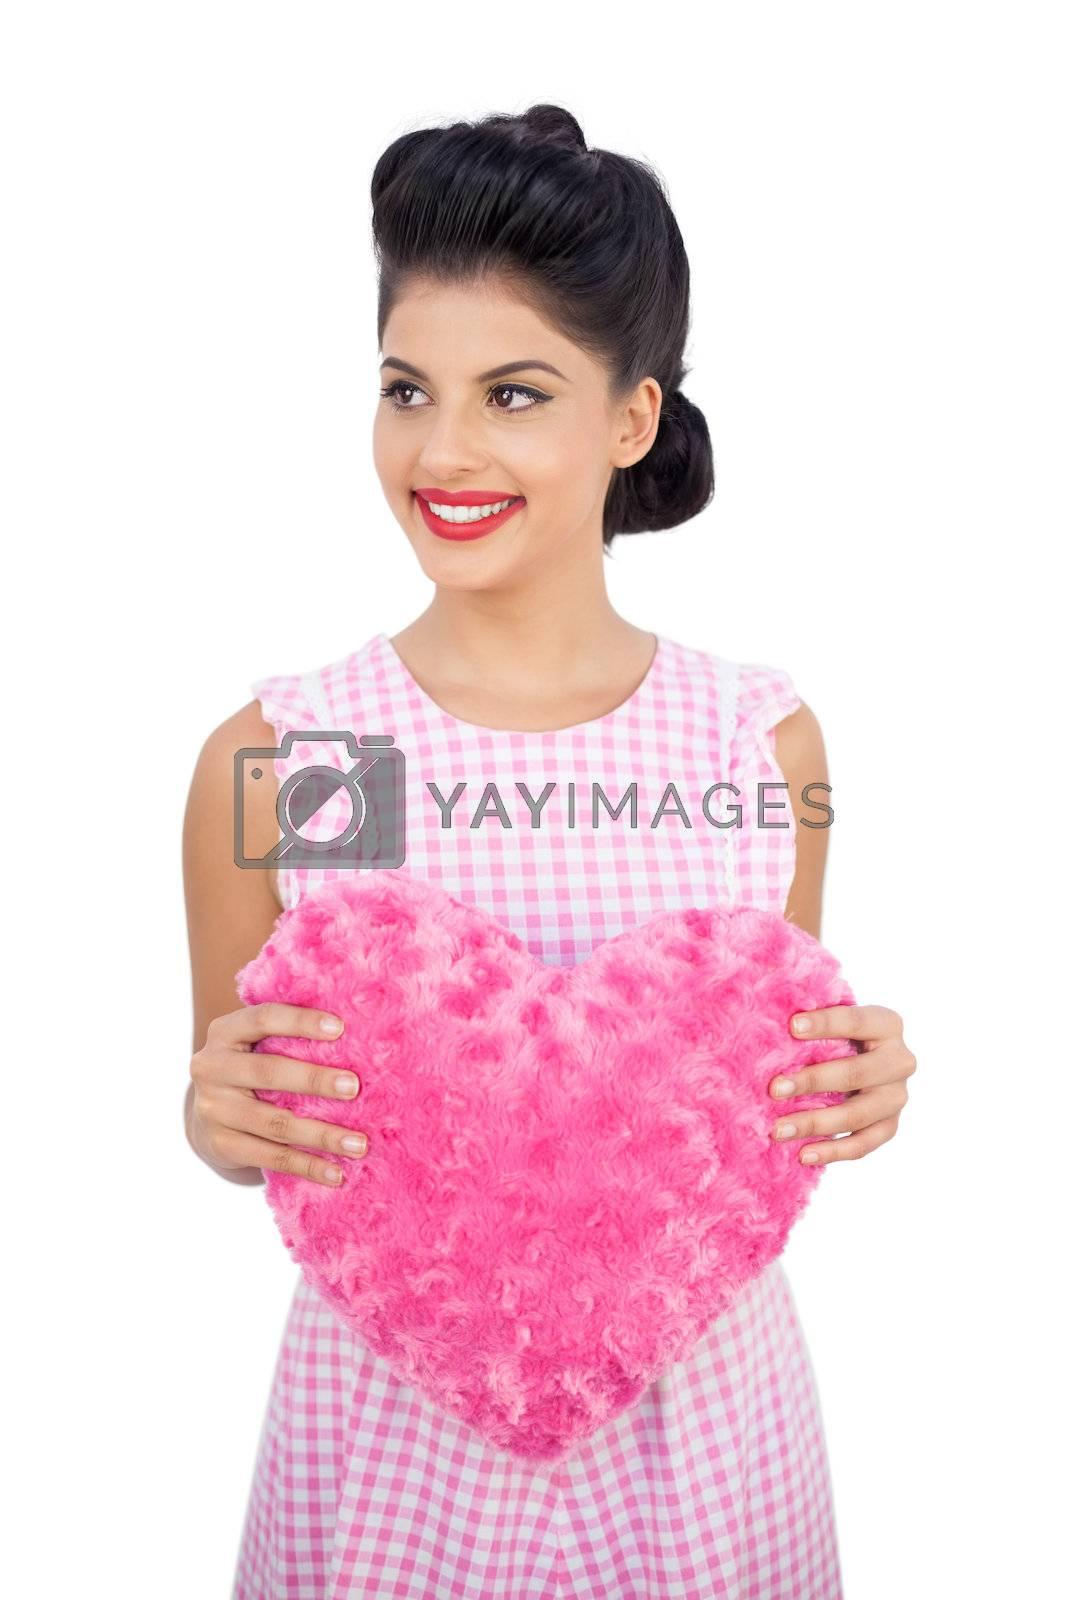 Joyful black hair model holding a pink heart shaped pillow by Wavebreakmedia